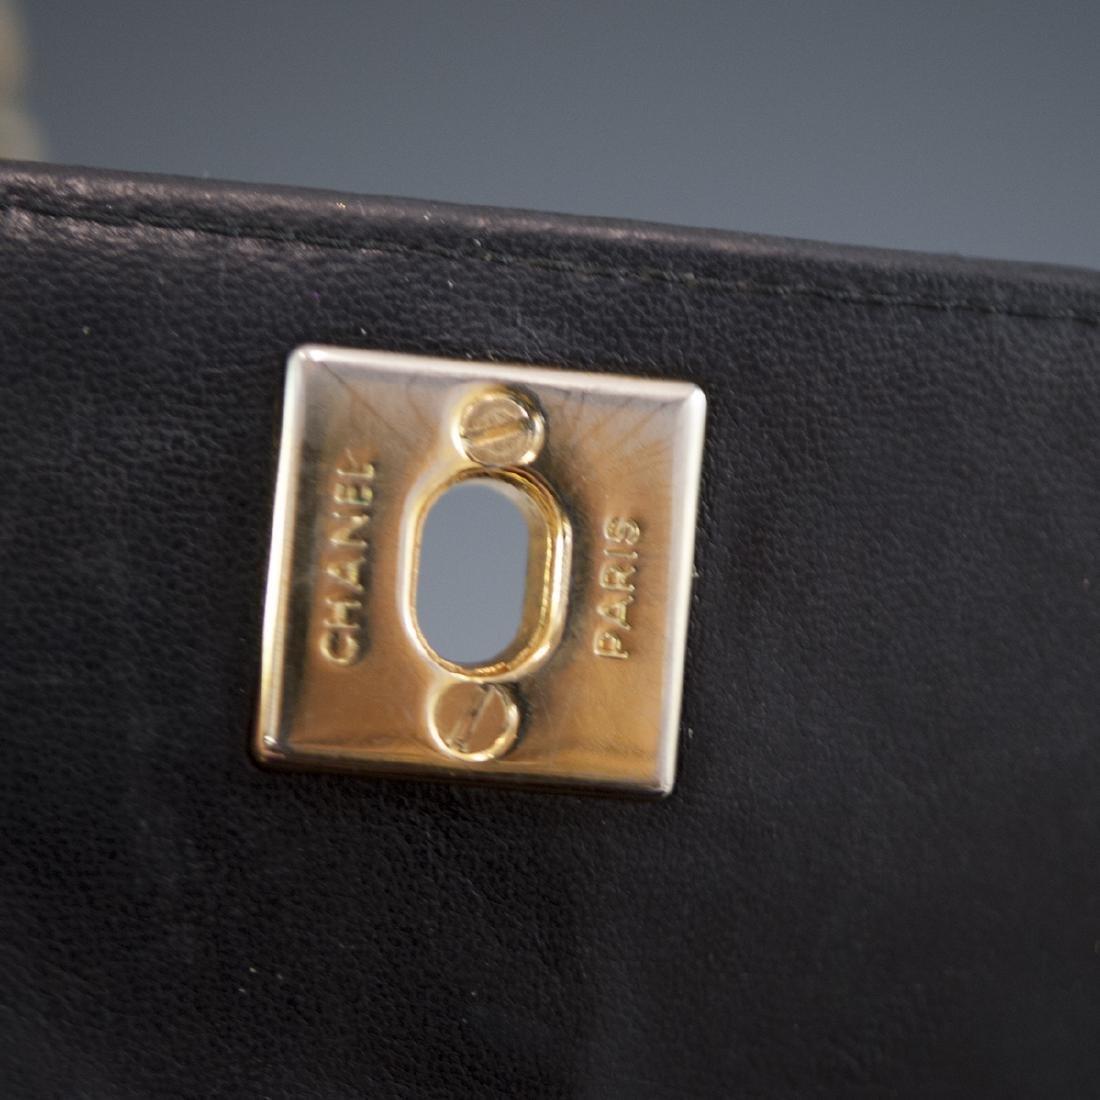 Chanel Mini Black Leather Flap Bag - 6